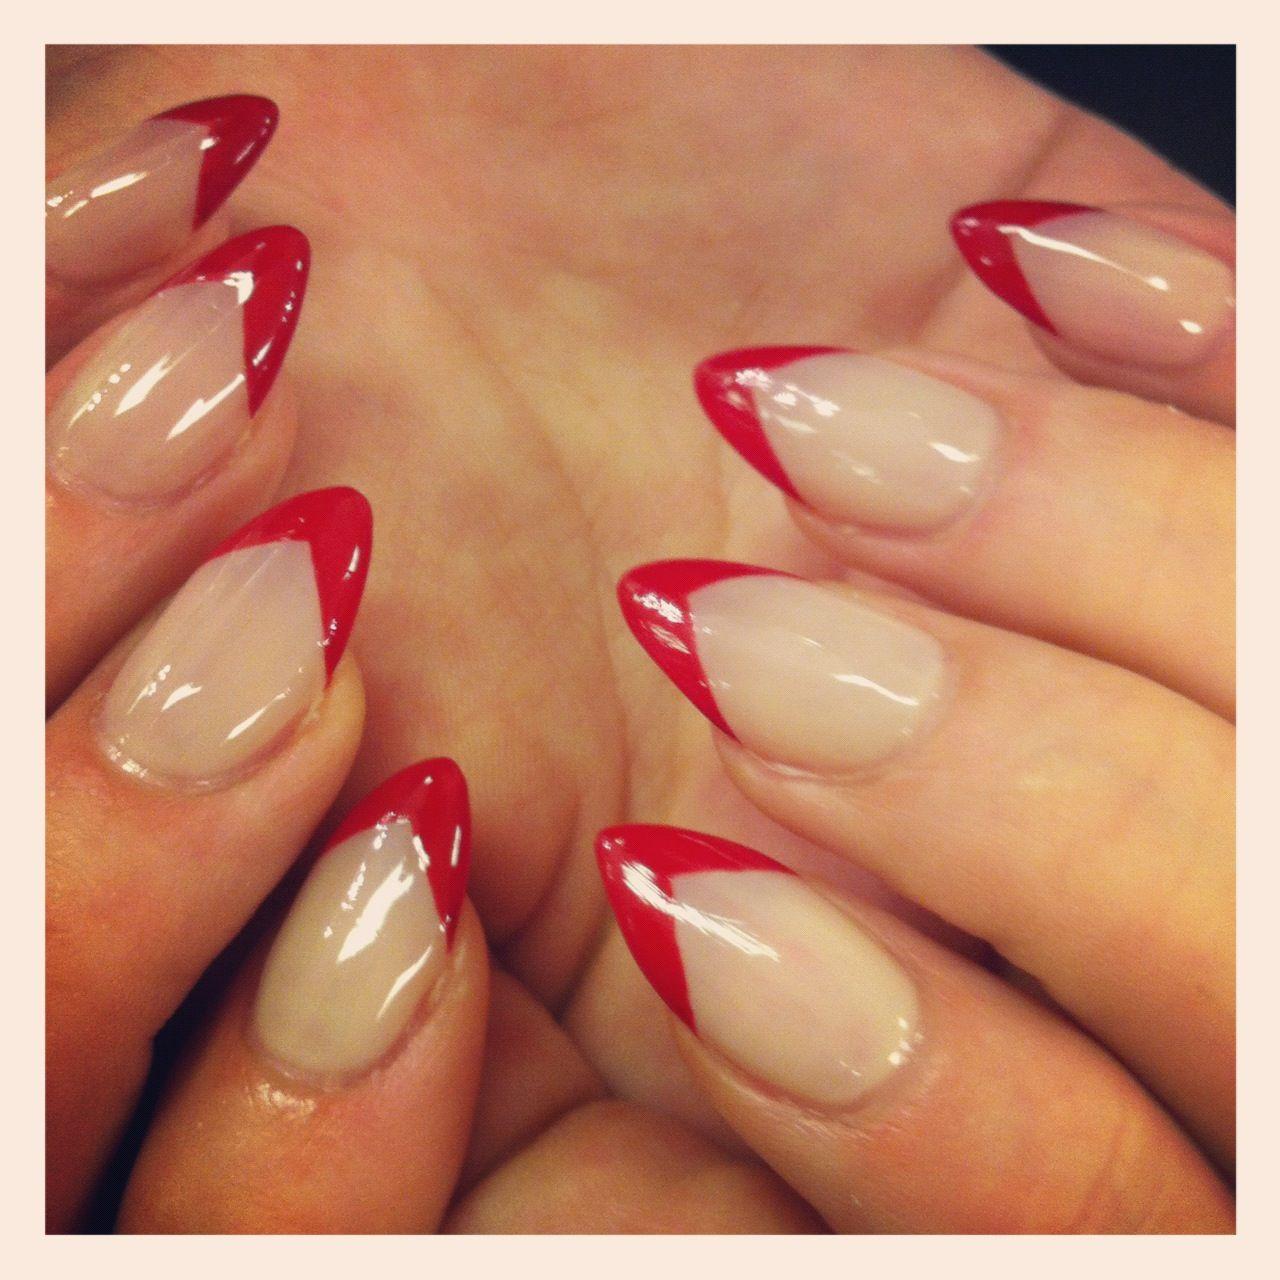 Img 1037 Jpg 1280 1280 Red Tip Nails Stiletto Nails Short